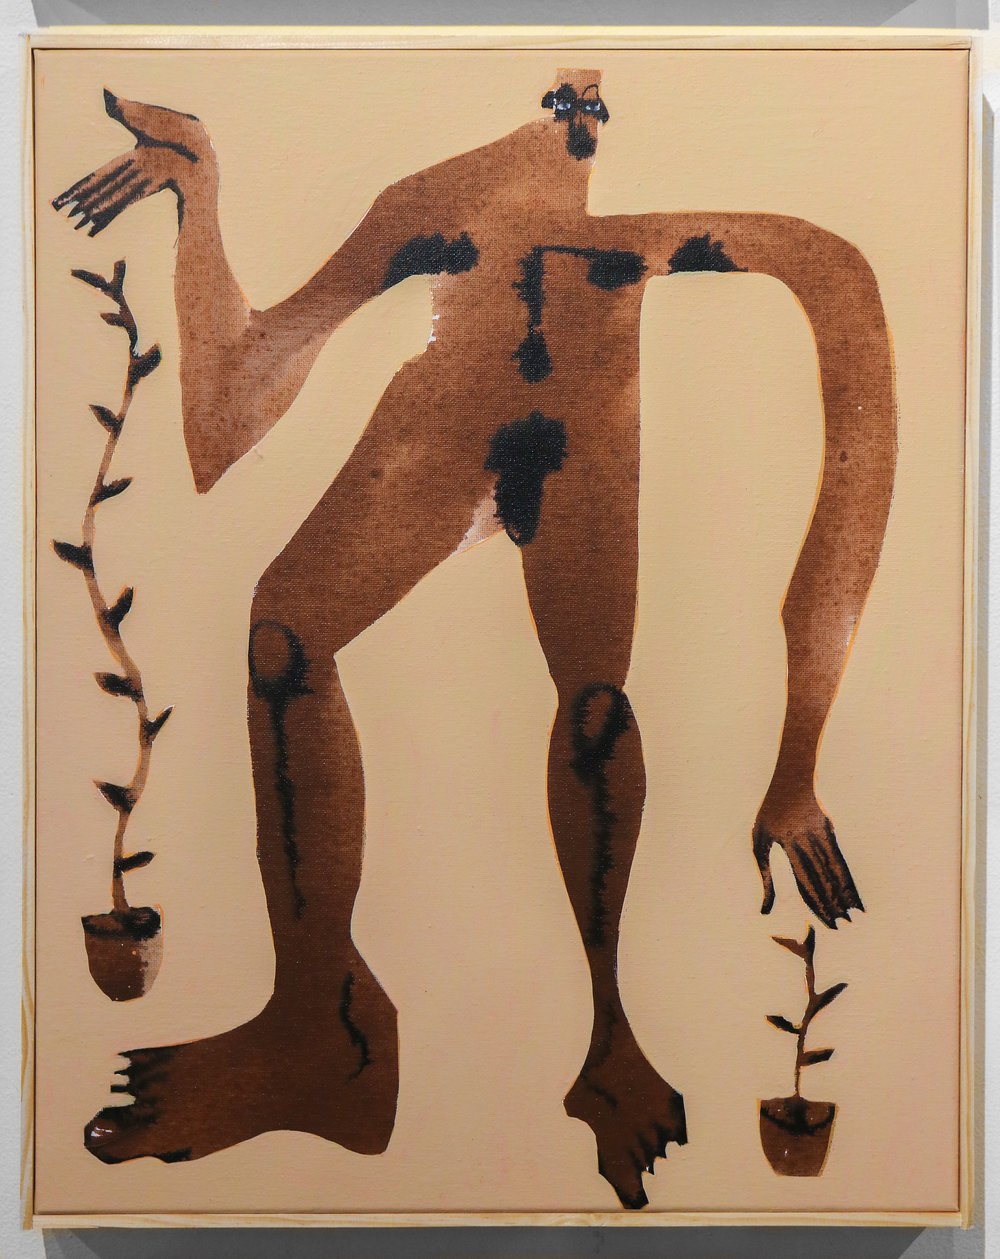 """Plantdad"" - 16 x 20 ""Acrylic & Ink on Canvas"